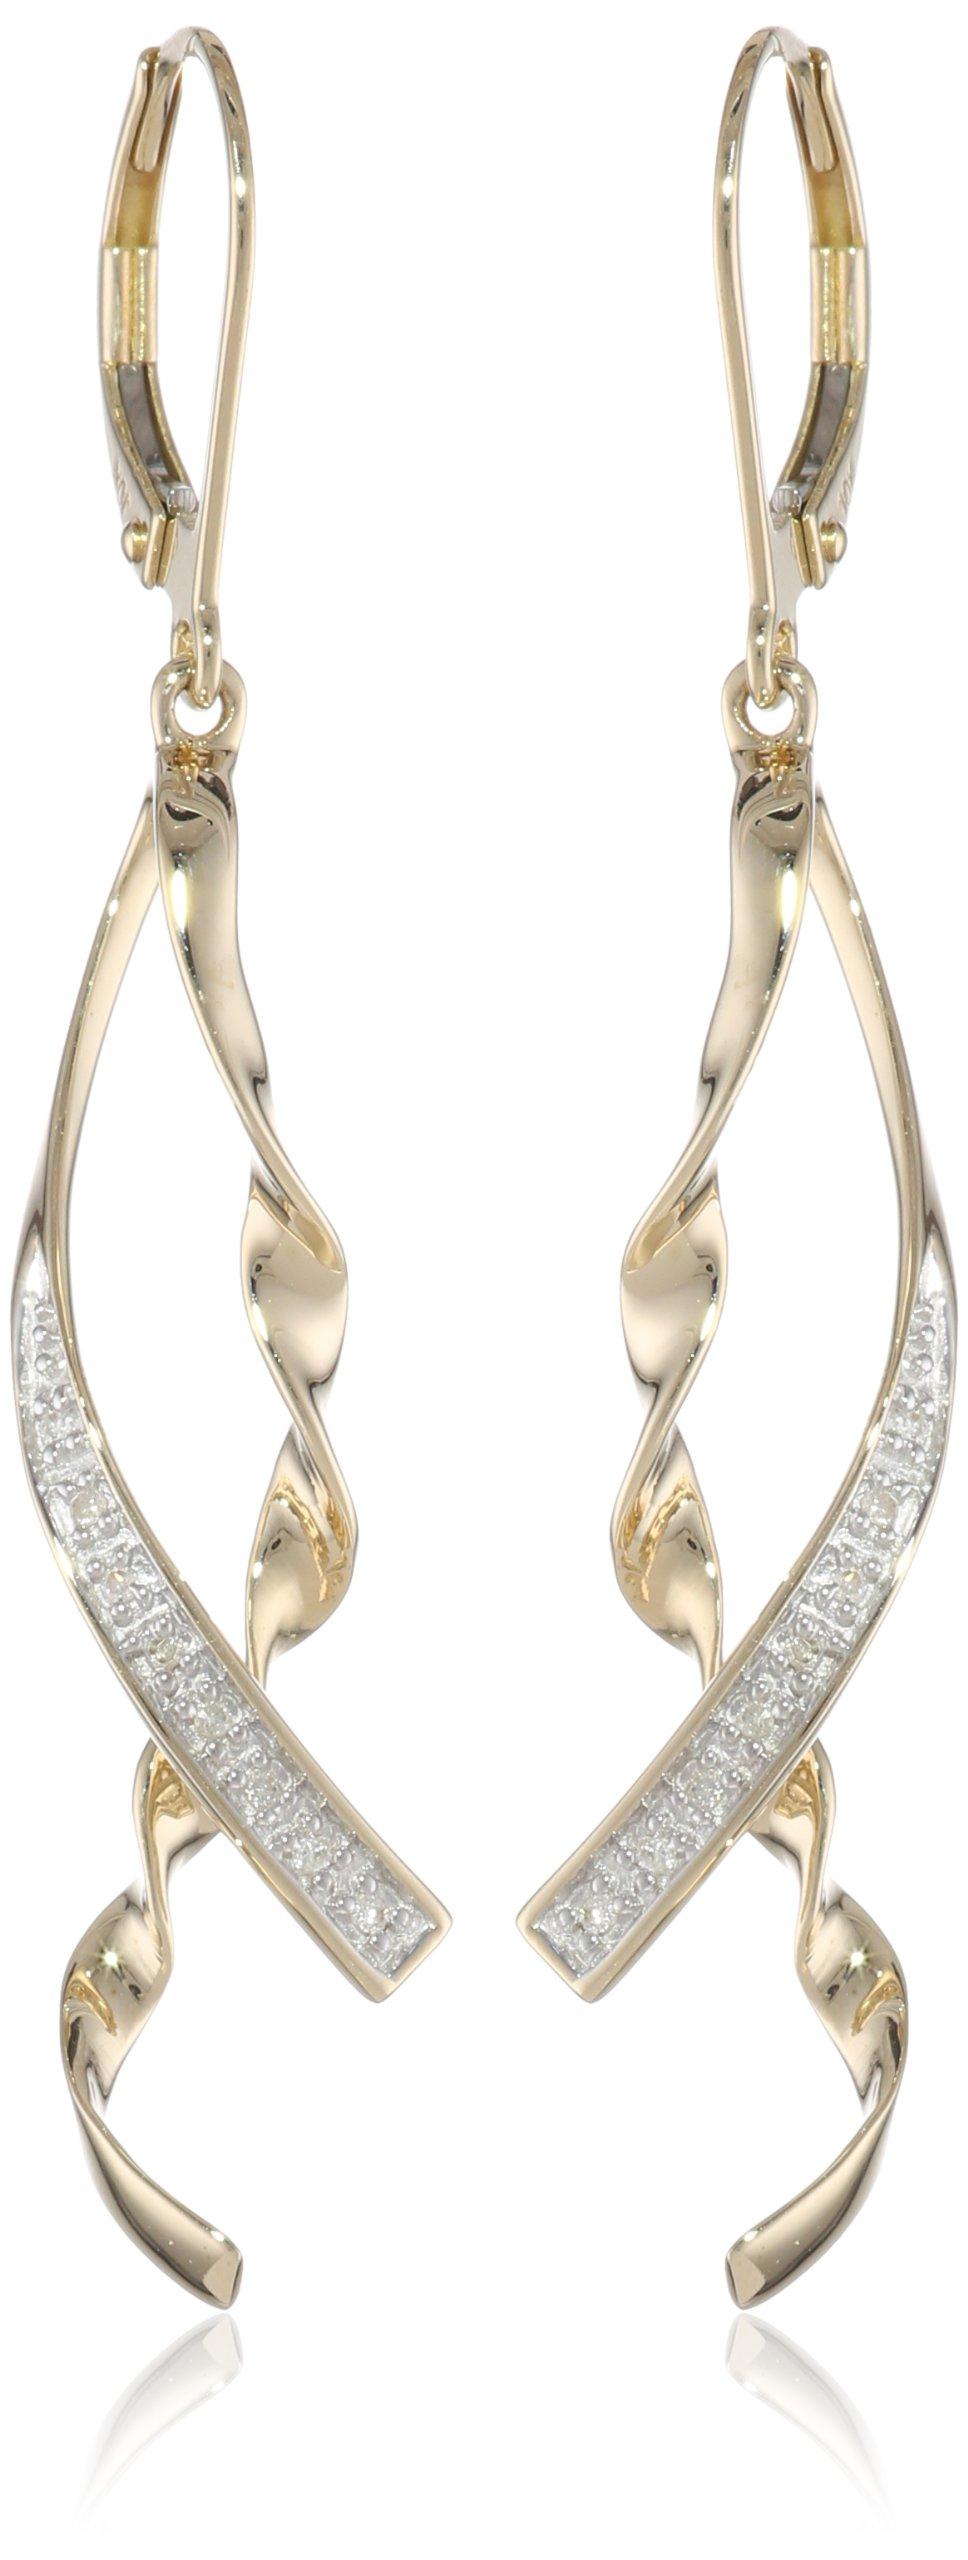 10k Yellow Gold Ribbon Diamond Earrings  image